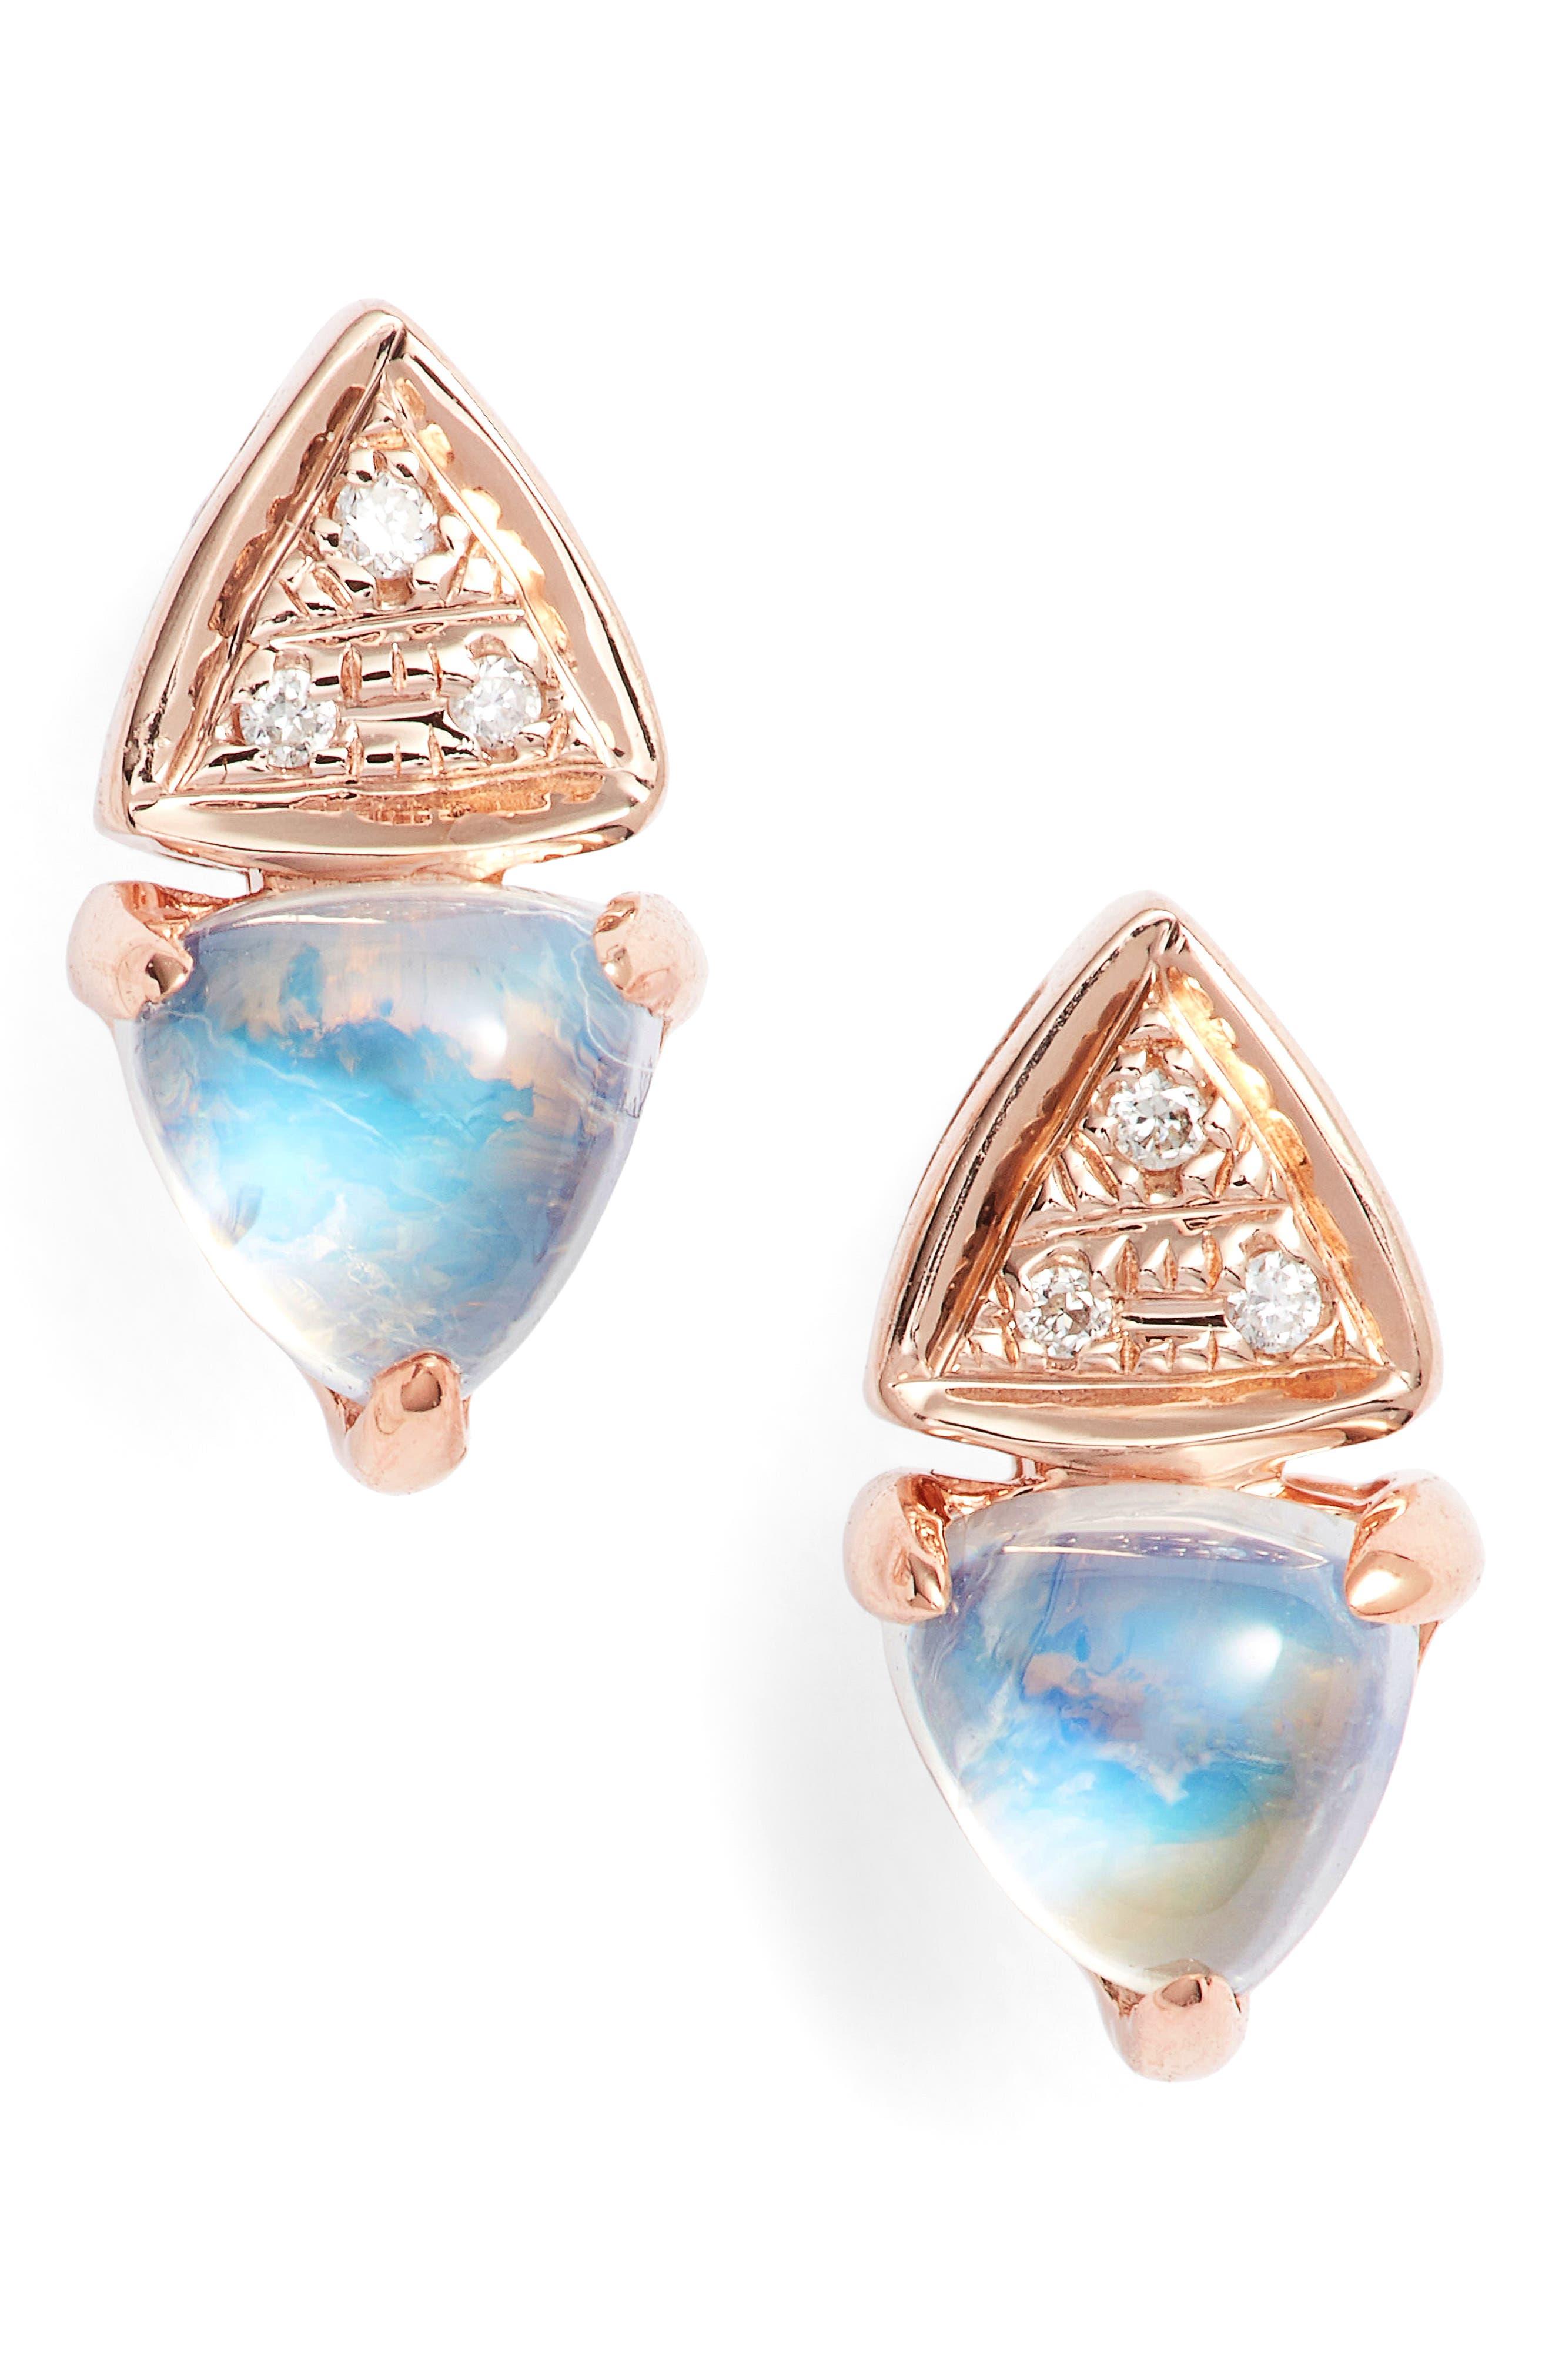 Diamond & Stone Stud Earrings,                         Main,                         color, Rose Gold